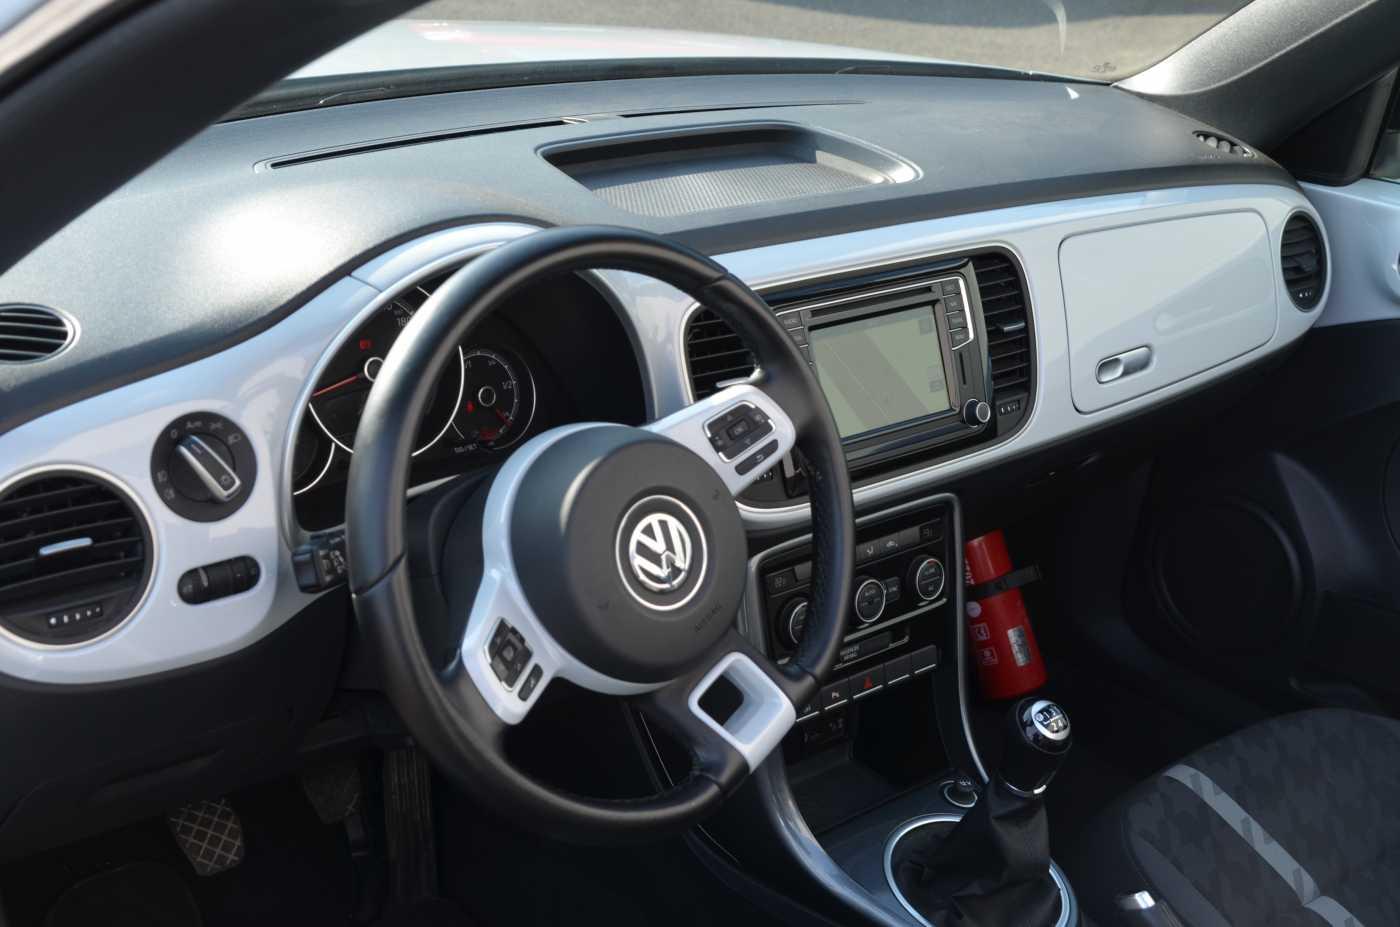 Volkswagen Beetle Mark 2 (2011) 1.2 TSI 8/12